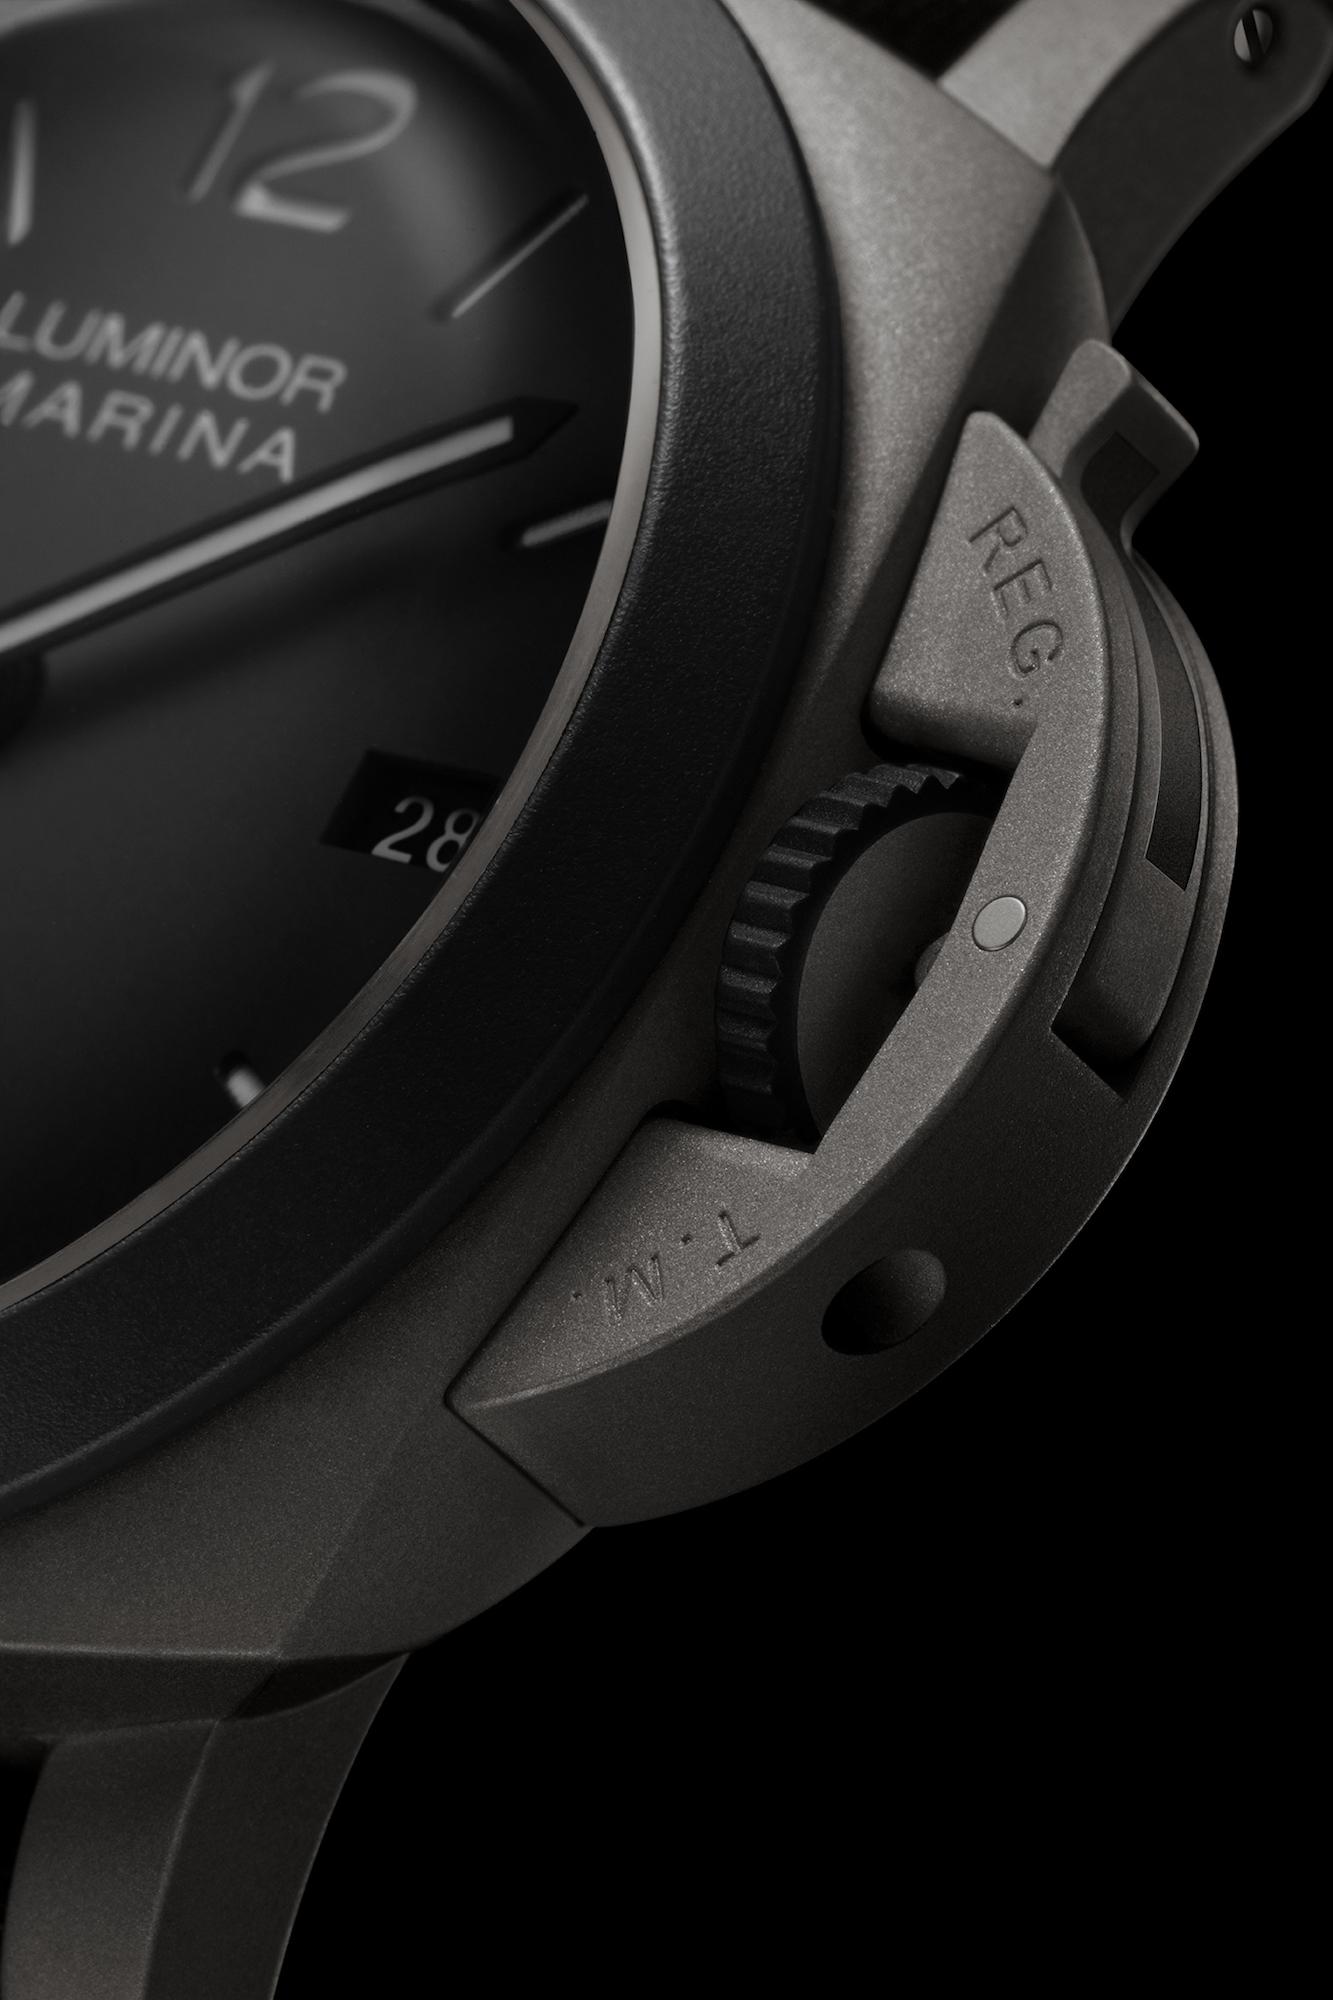 Panerai Luminor Marina 44mm Edición Guillaume Nery PAM01122 detalle bisel y corona